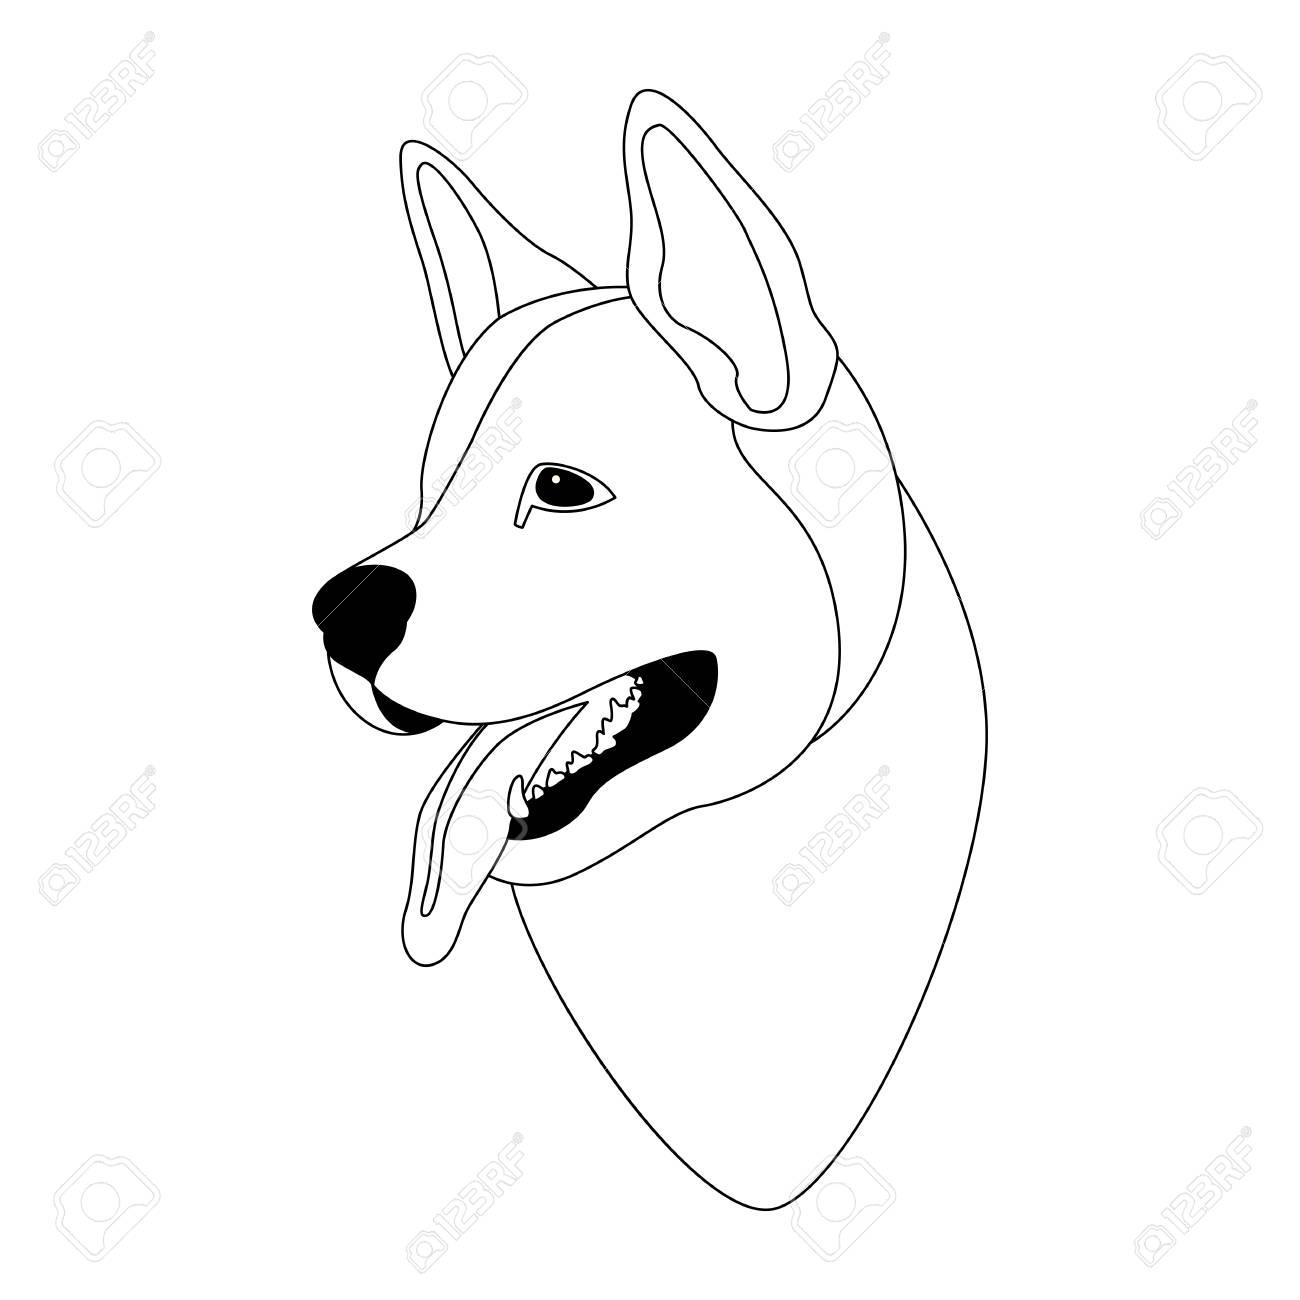 Husky dog face illustration line drawing head stock vector 85352859